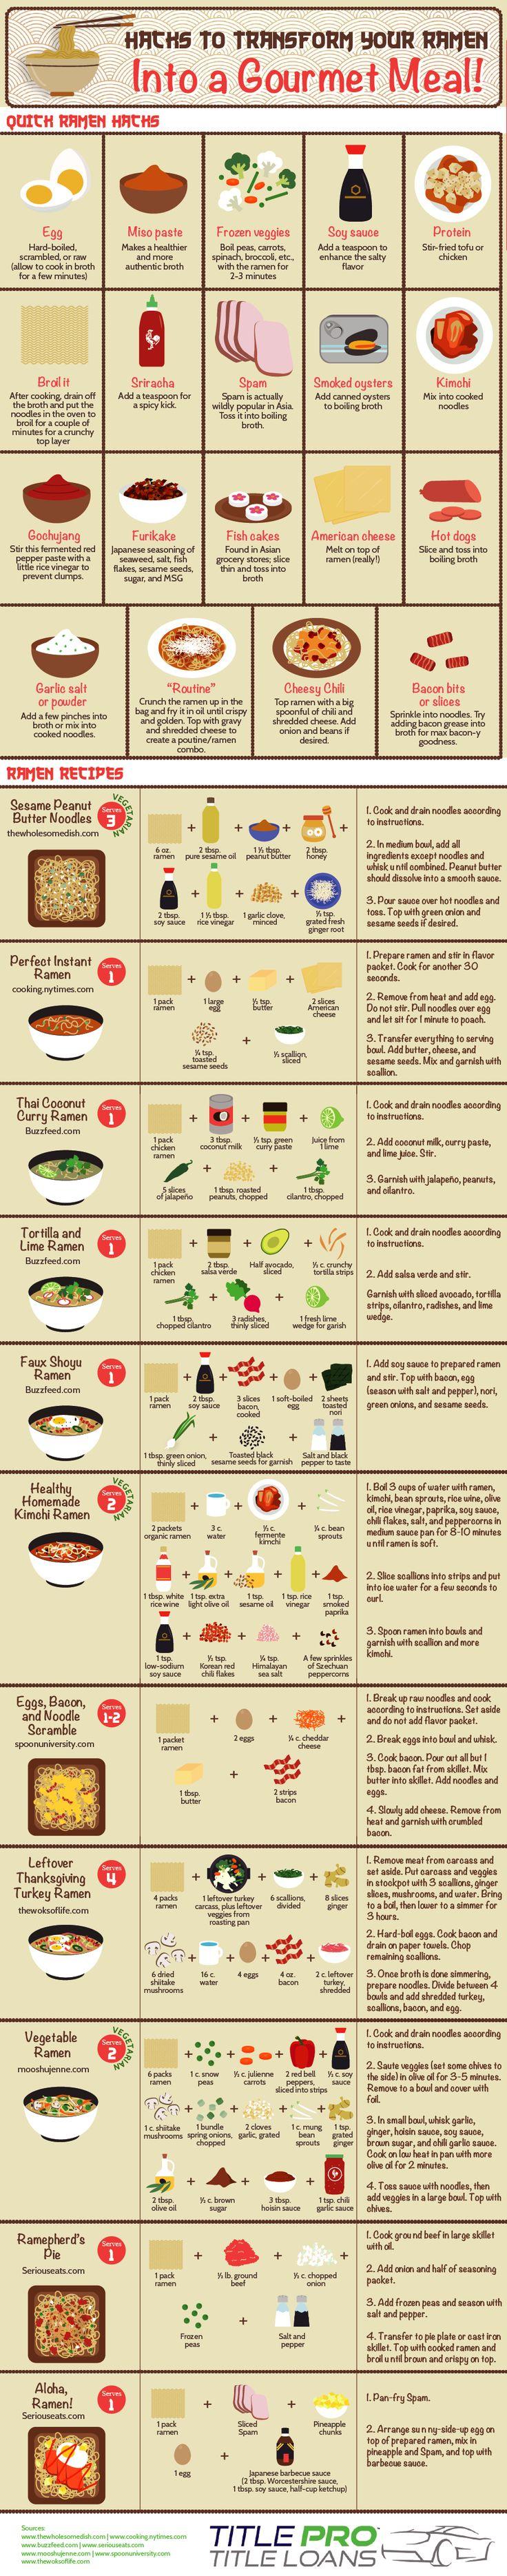 Turn your boring ramen into a gourmet meal!